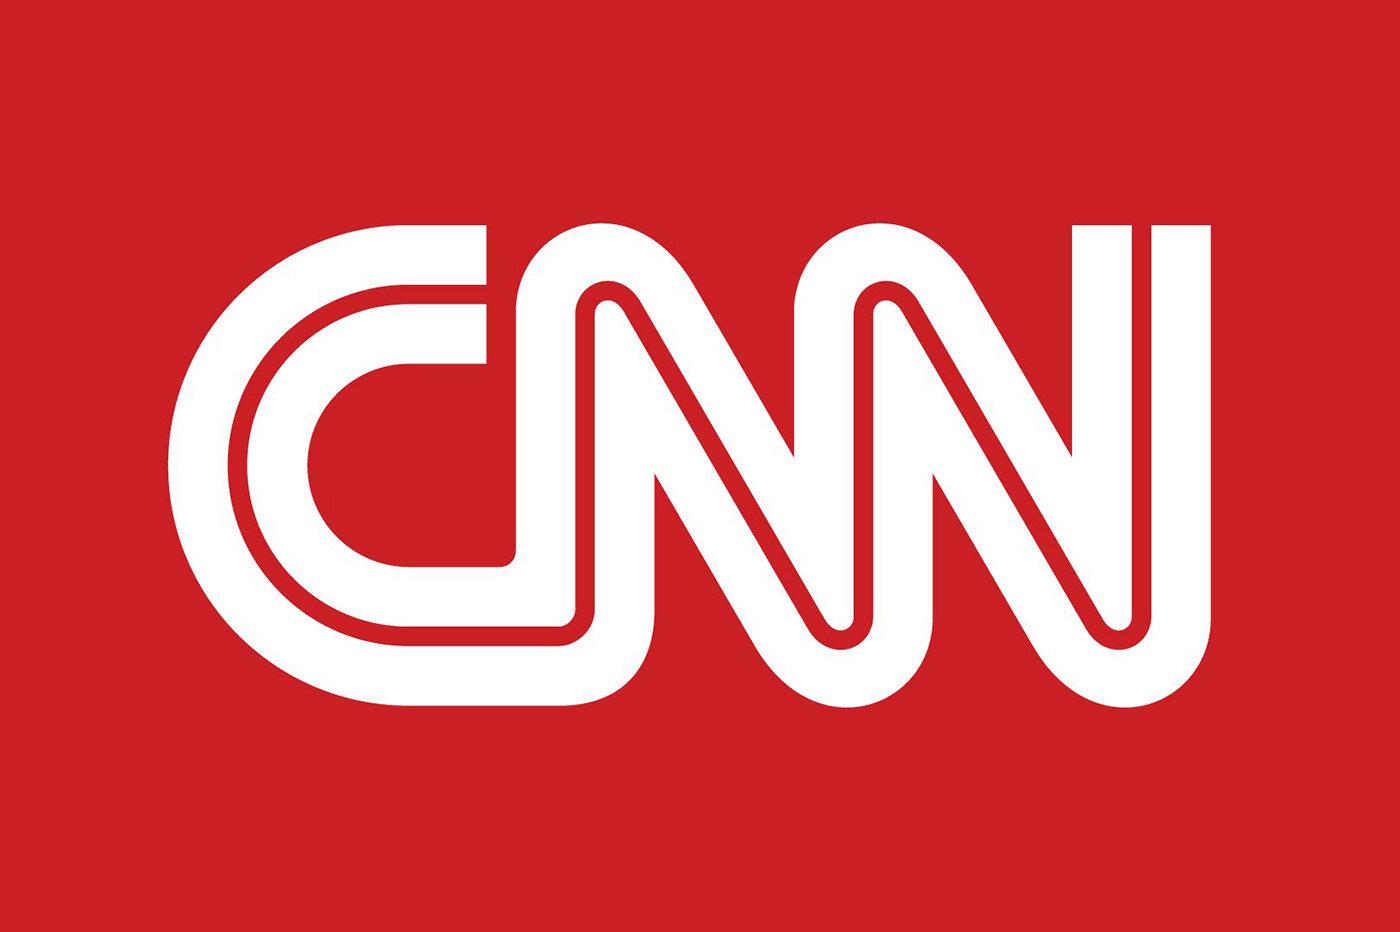 CNN LOGO.jpg